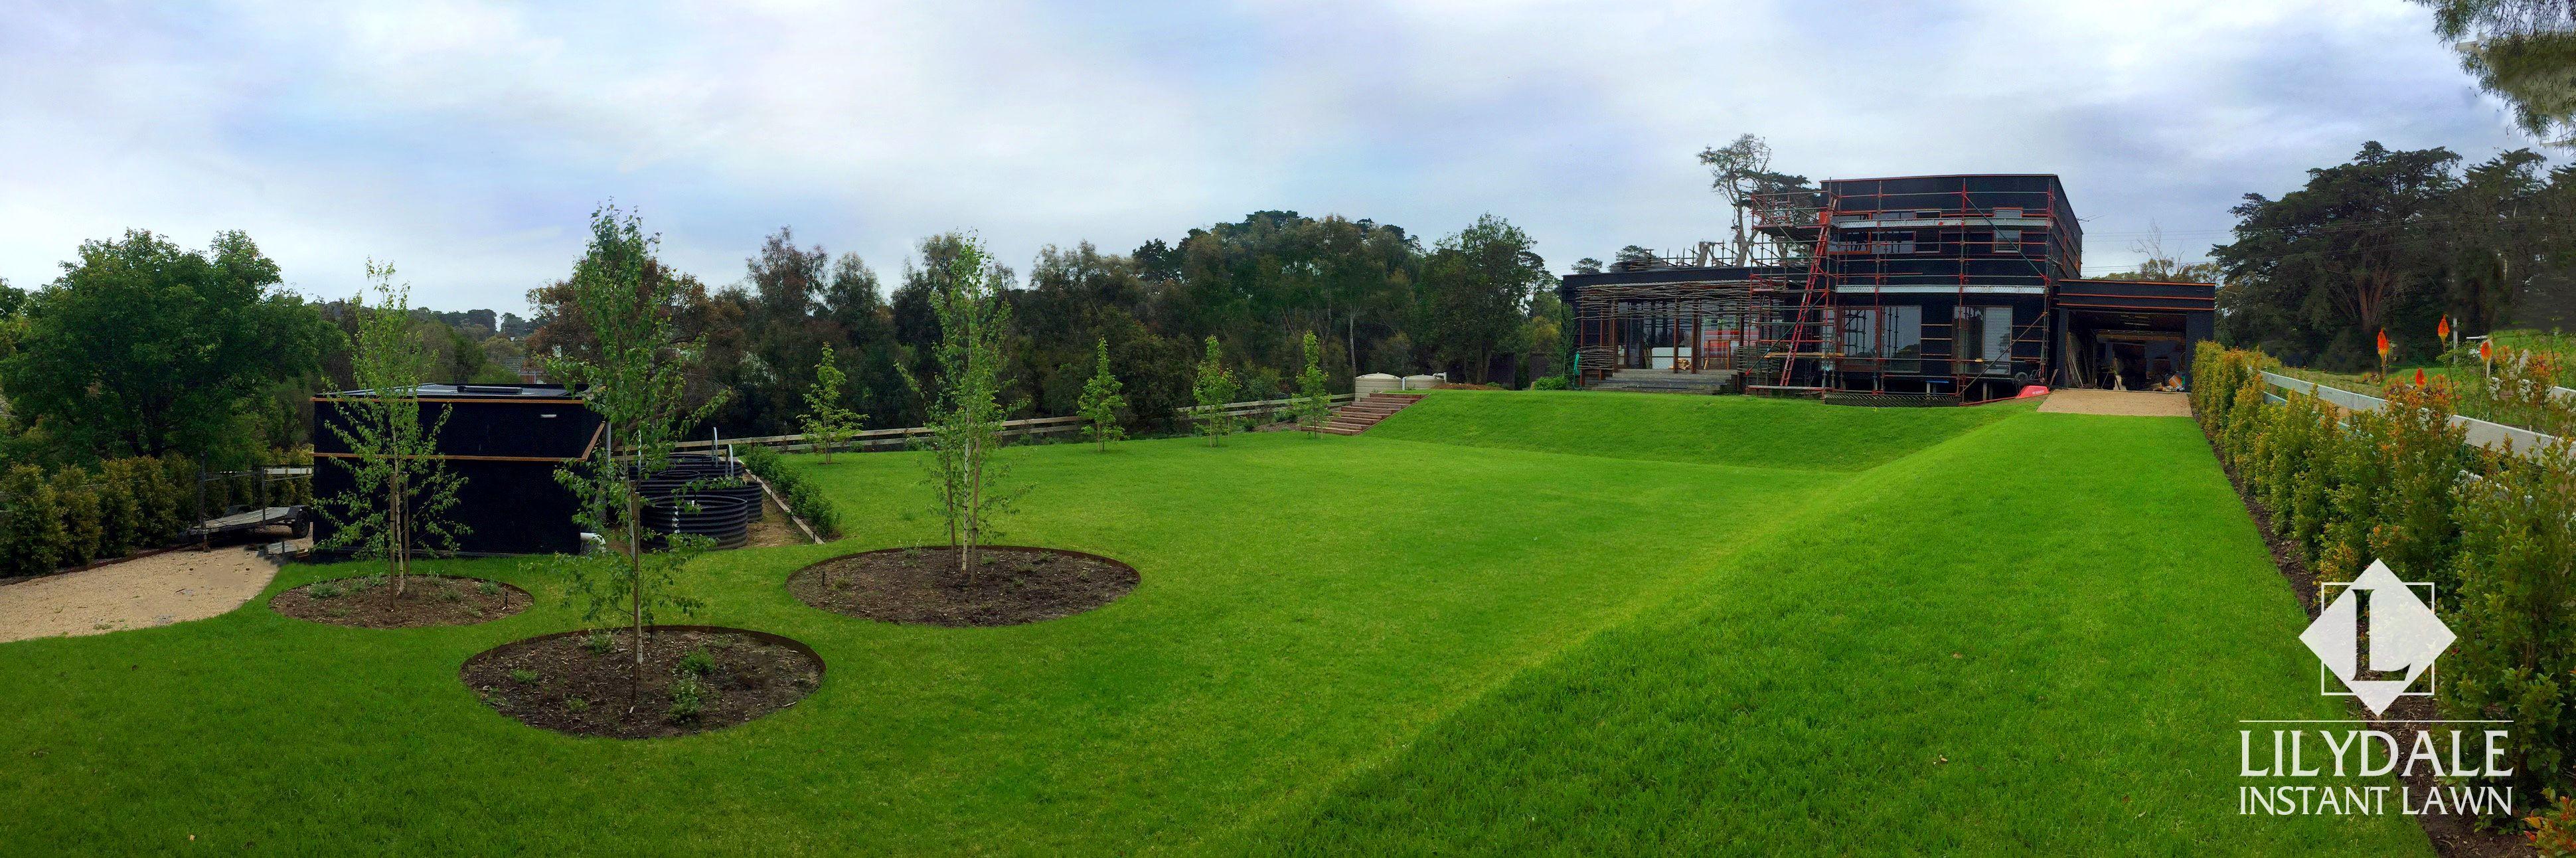 Lilydale grass